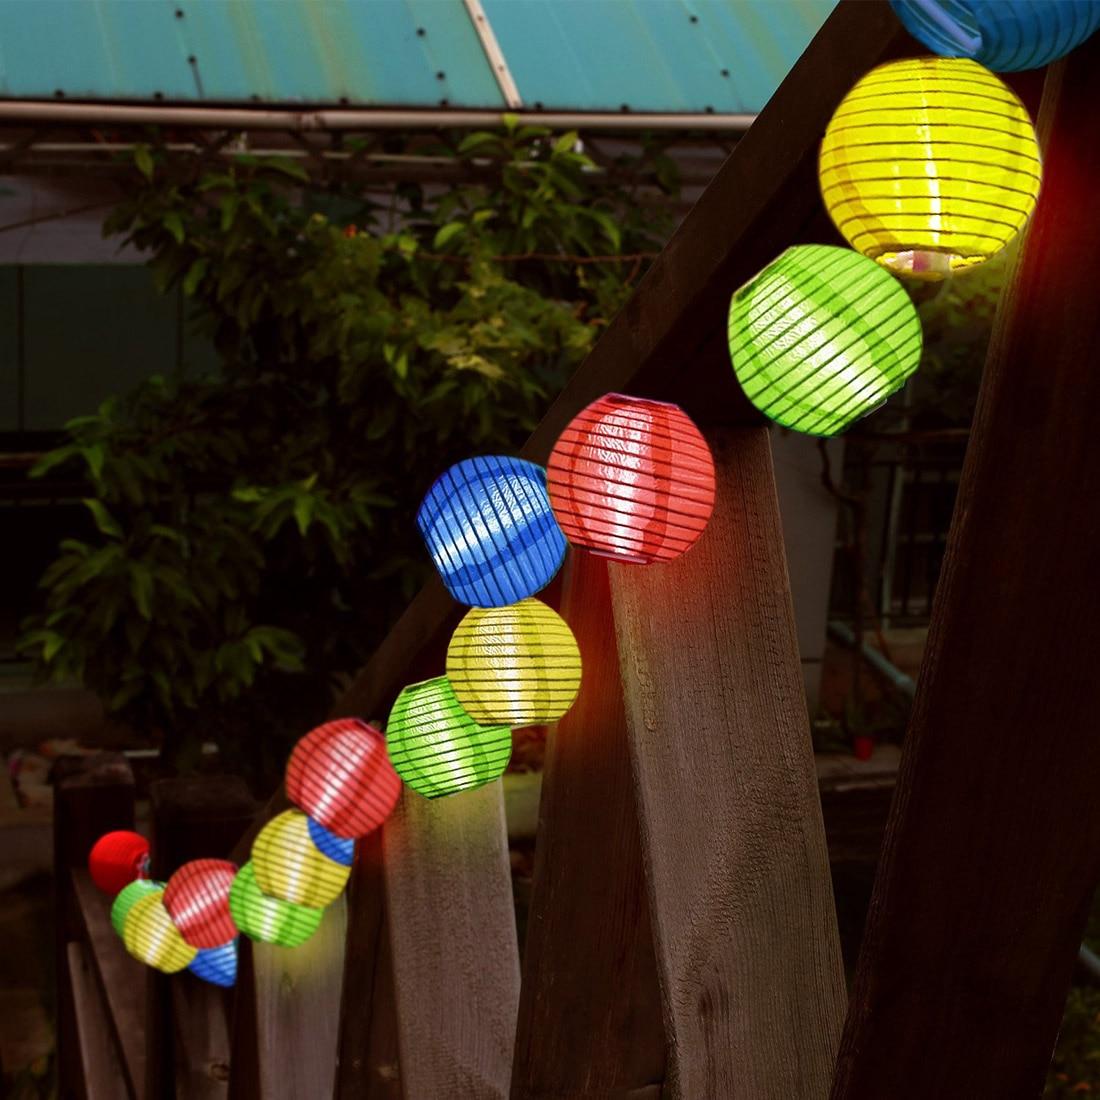 Set of 20 Solar Chines Lantern Fairy Lights Outdoor Solar Lights, 2 Lighting Modes